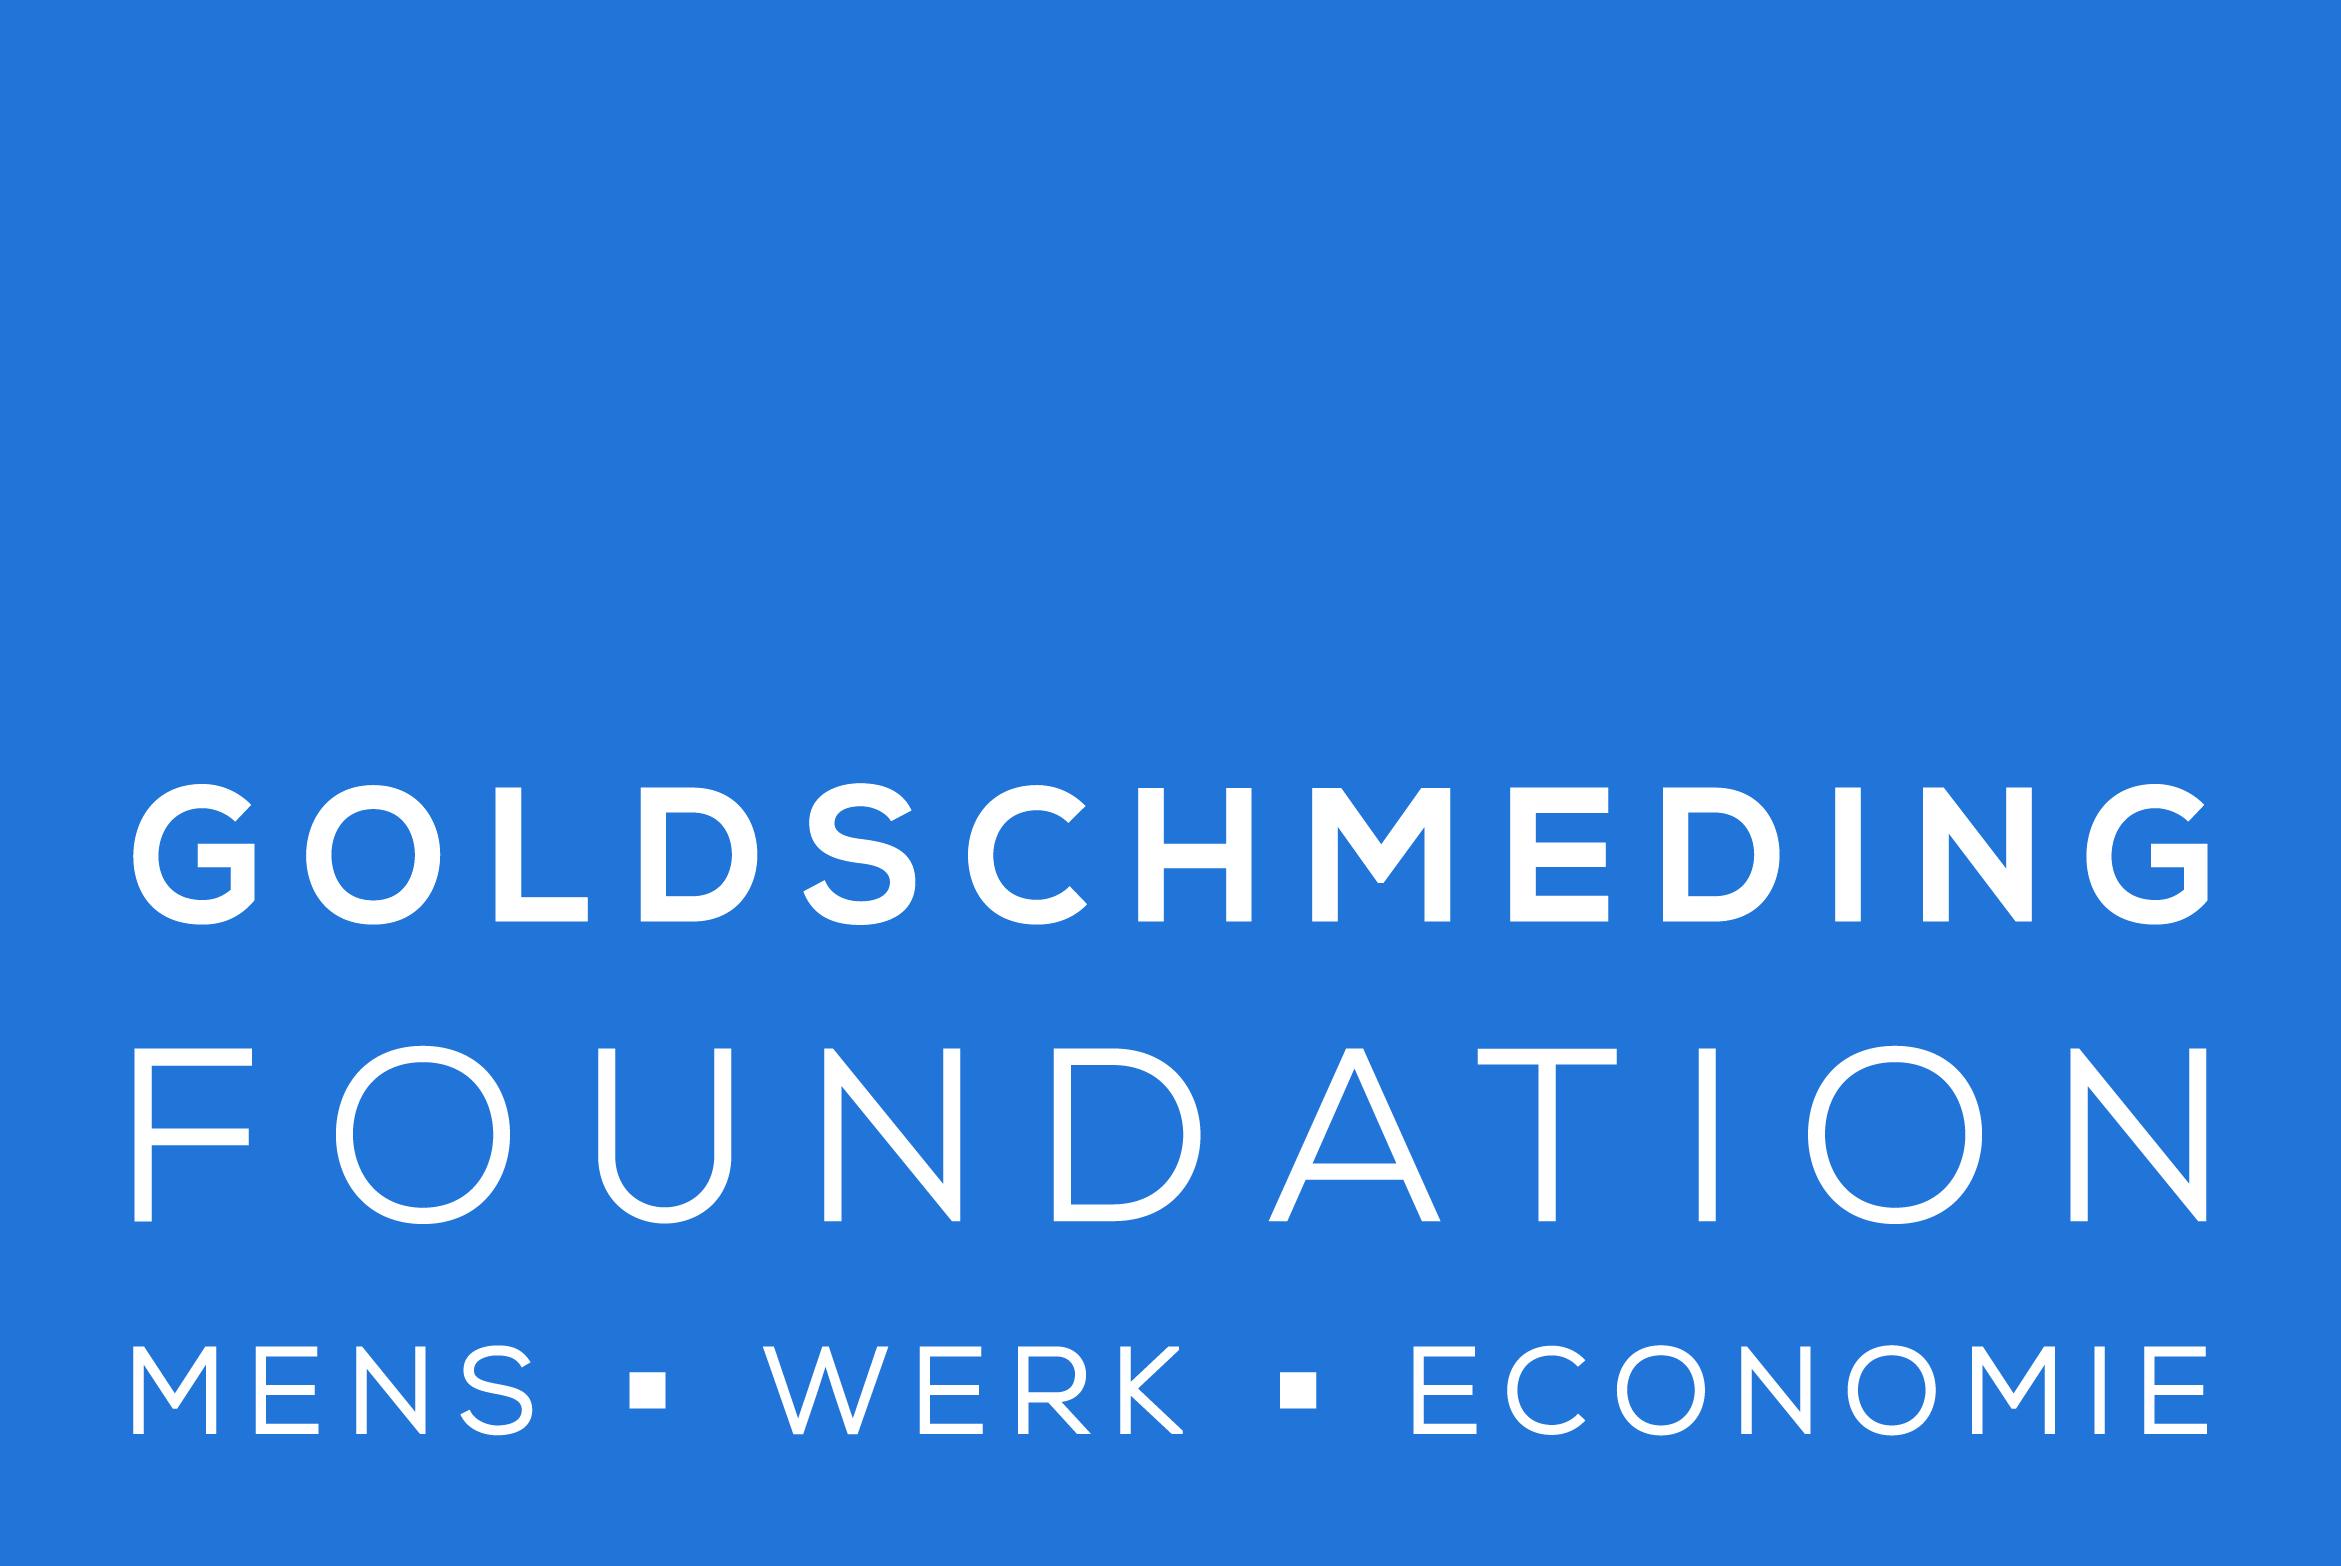 Goldschmeding Foundation